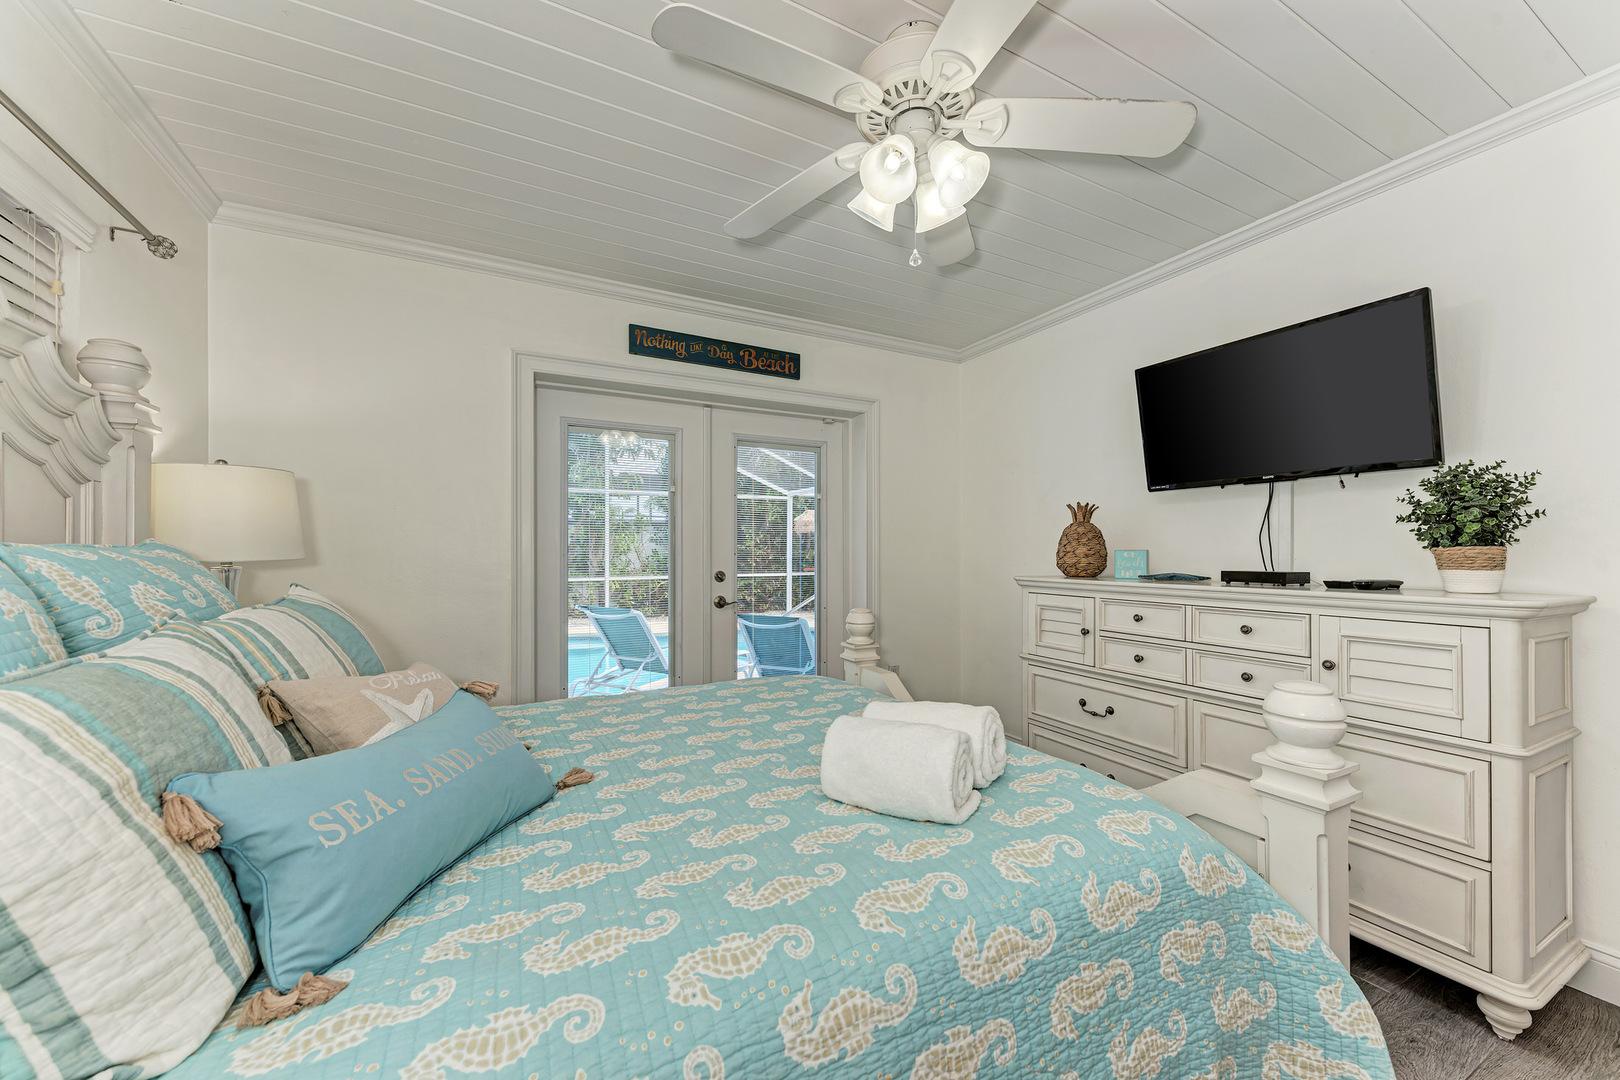 Barefoot Bungalow guest bedroom alternate view